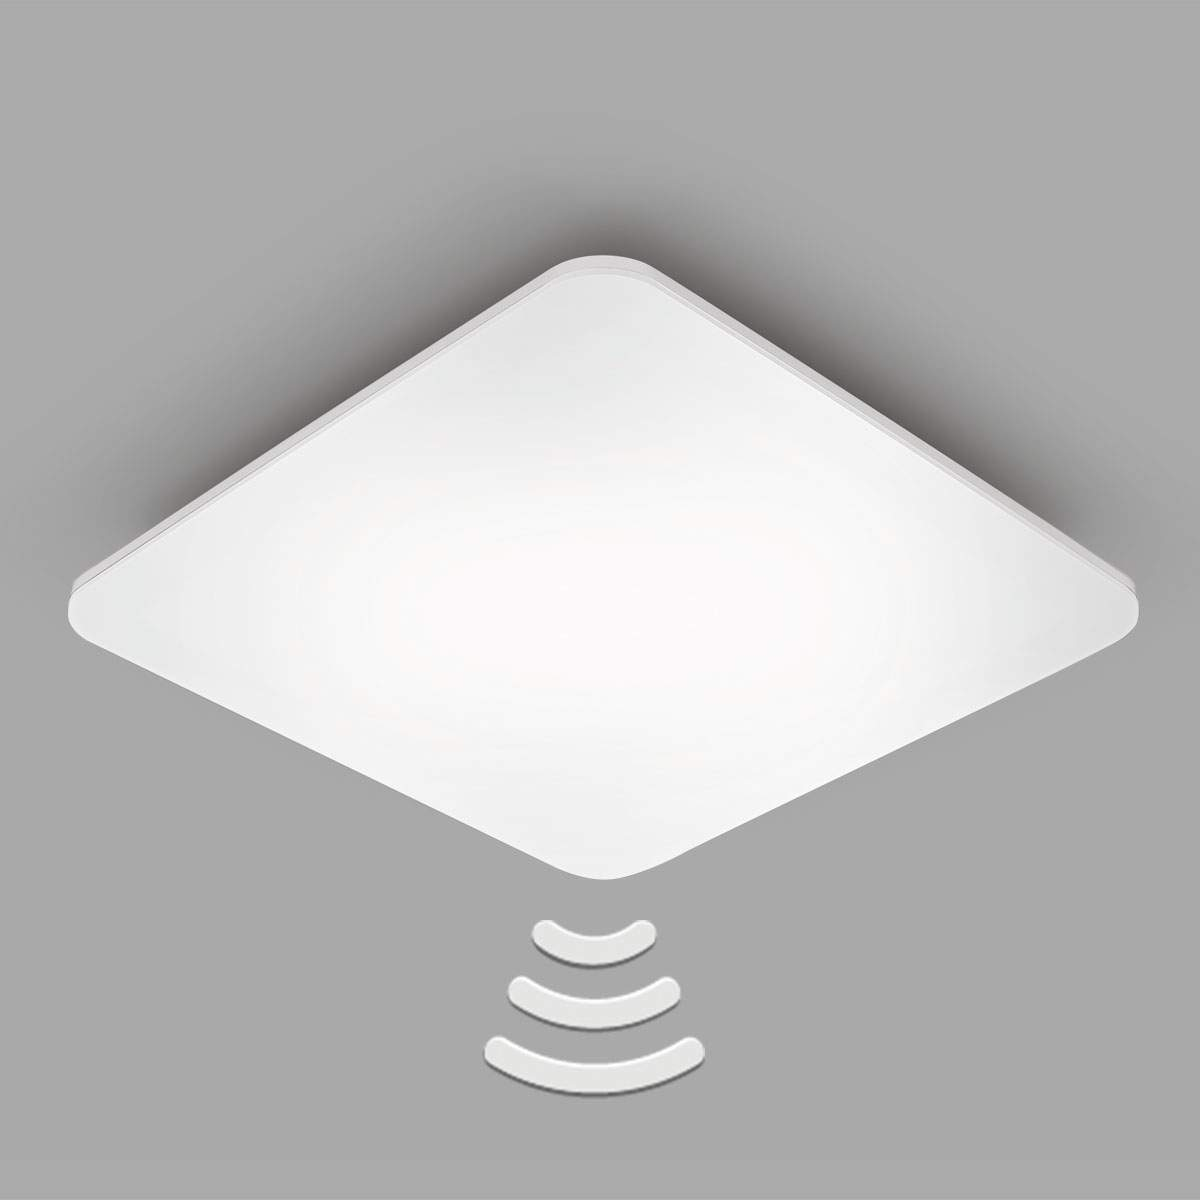 STEINEL RS Pro LED Q1 plafoniera sensore HF bianco Illuminazione per interni